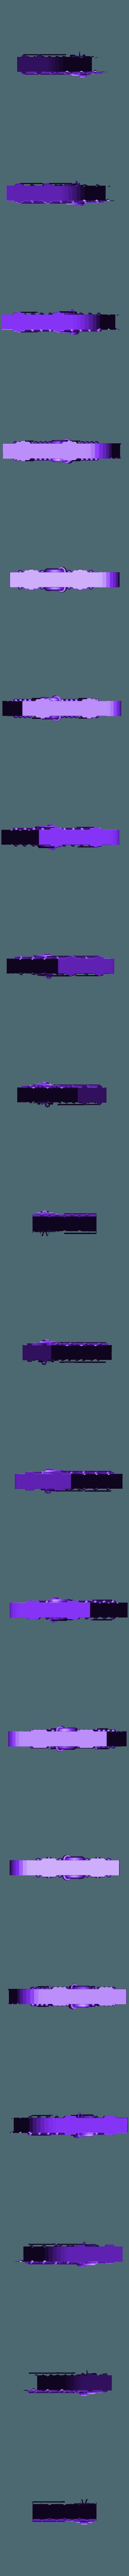 brick_door.stl Download free STL file Brick Doorway • Model to 3D print, daandruff